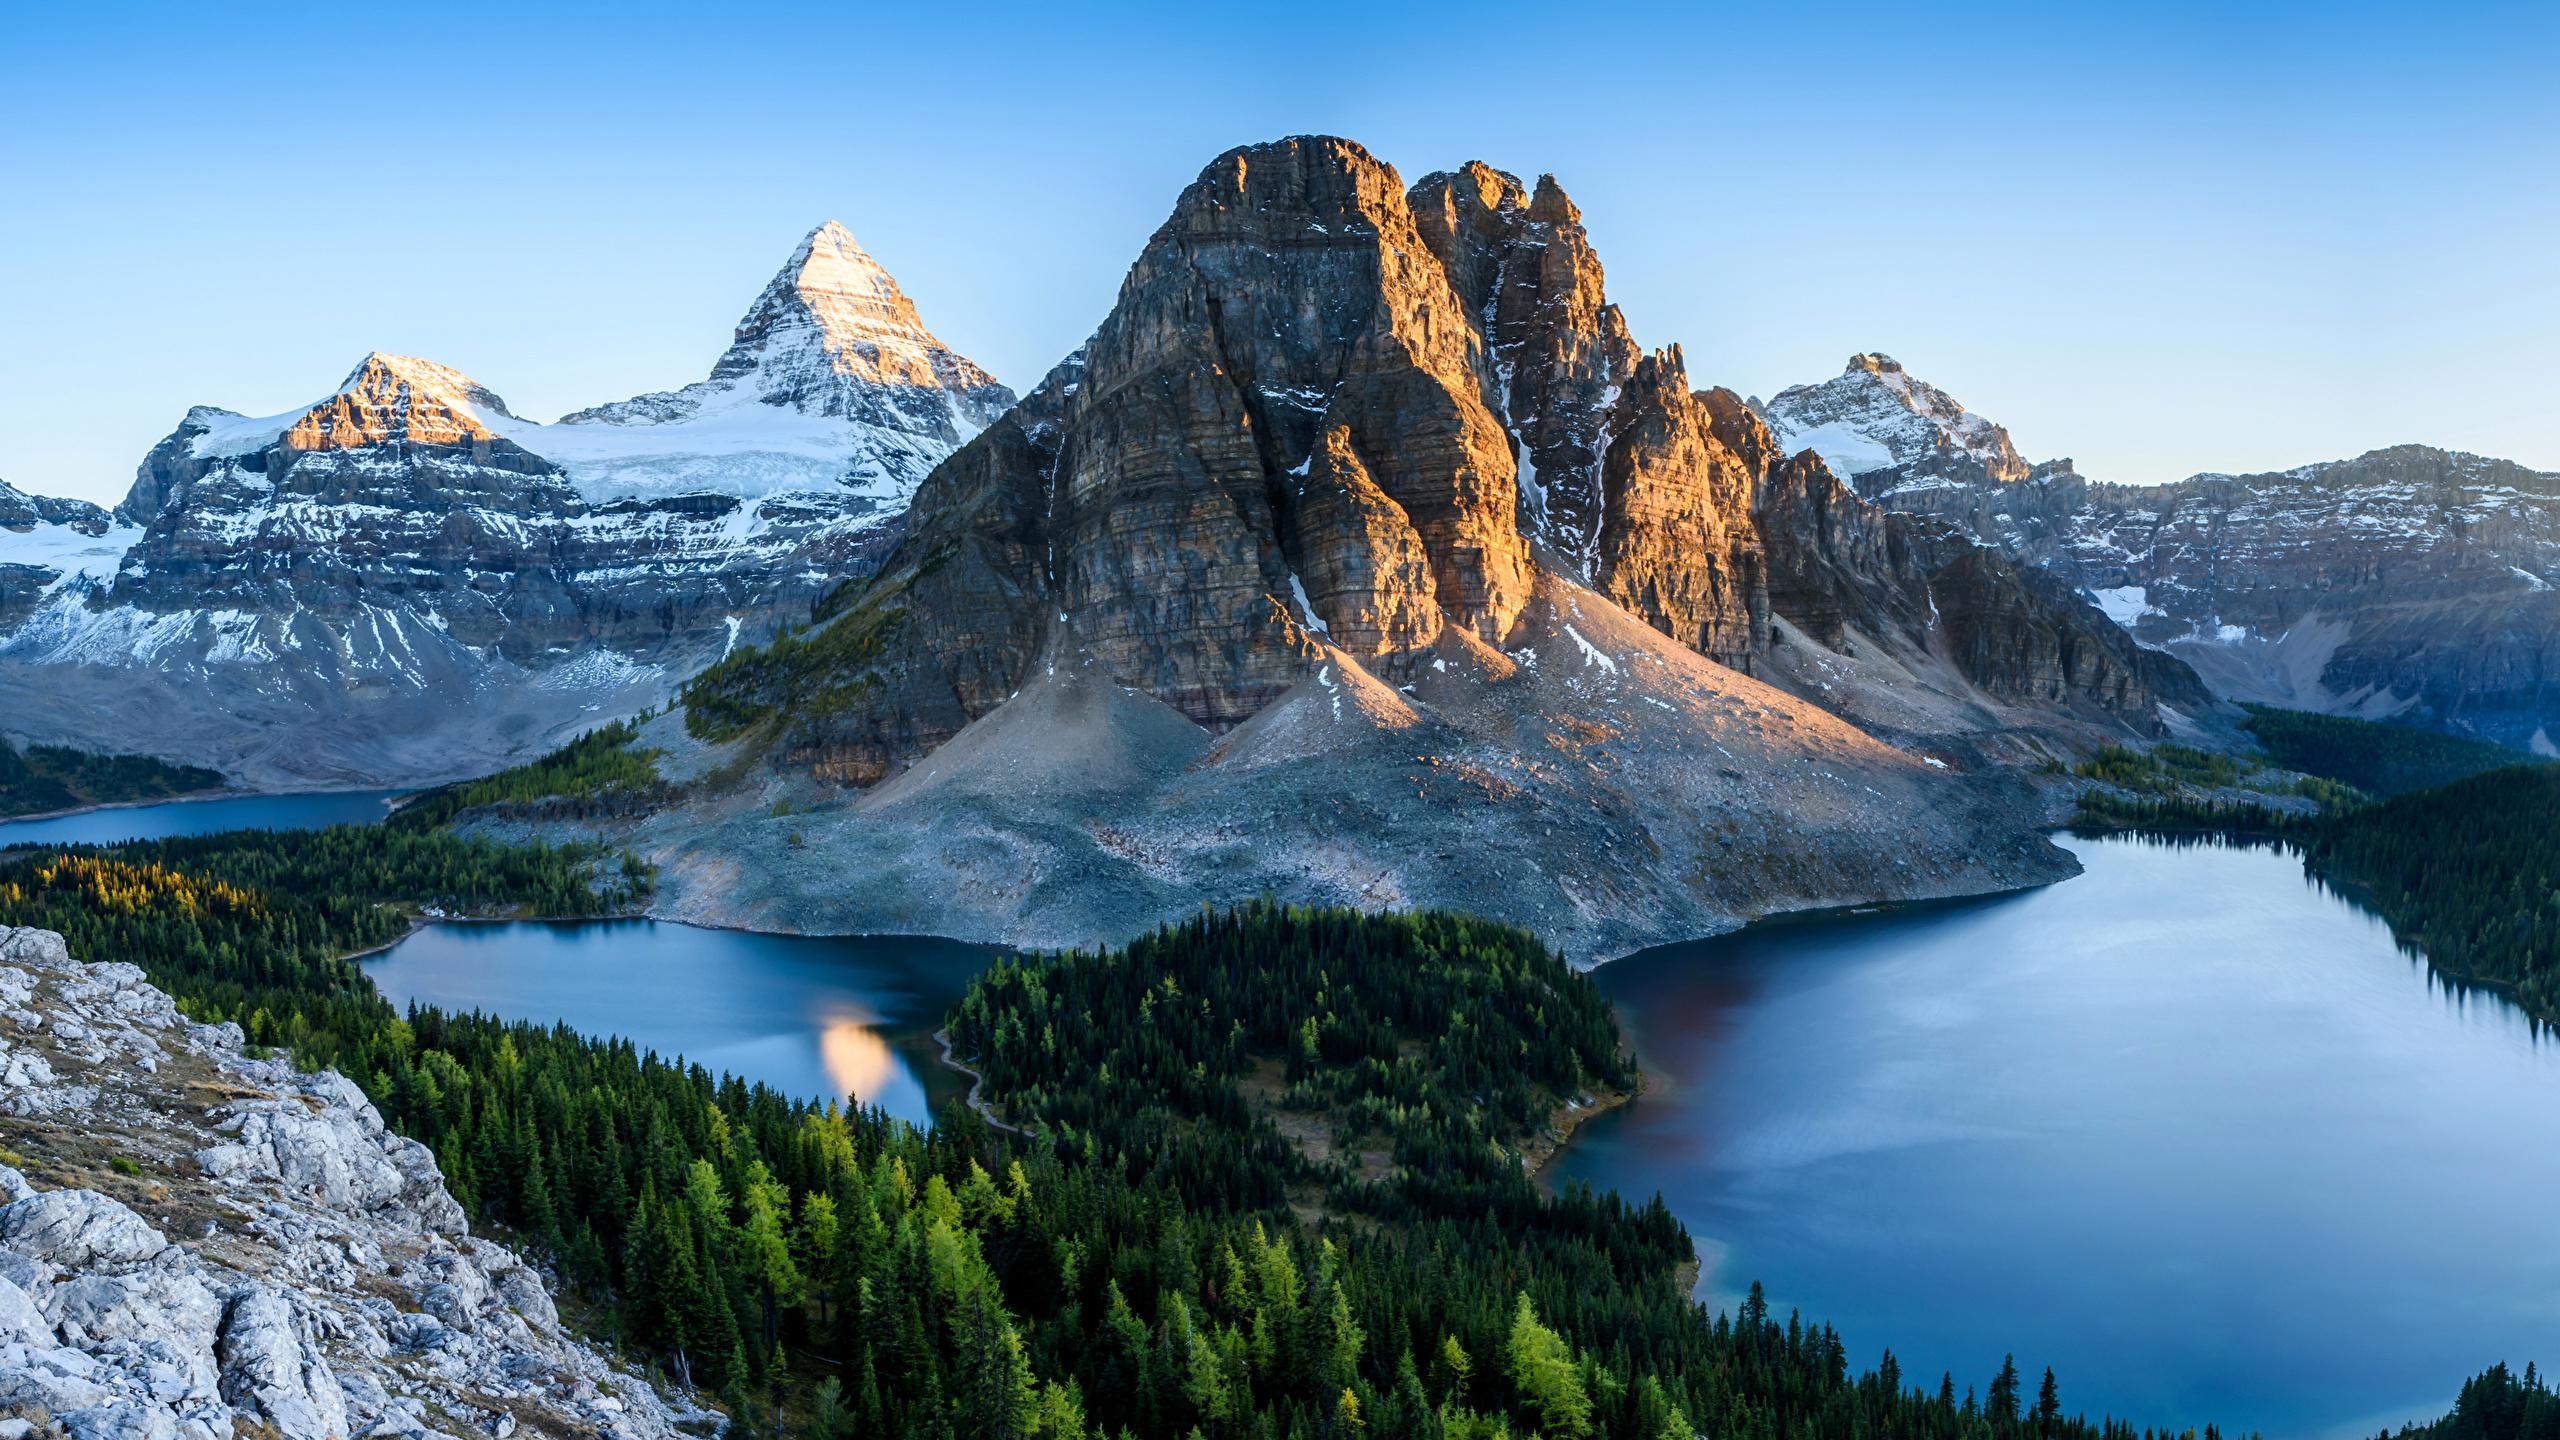 Fonds Decran 2560x1440 Canada Parc Montagnes Lac Forêts